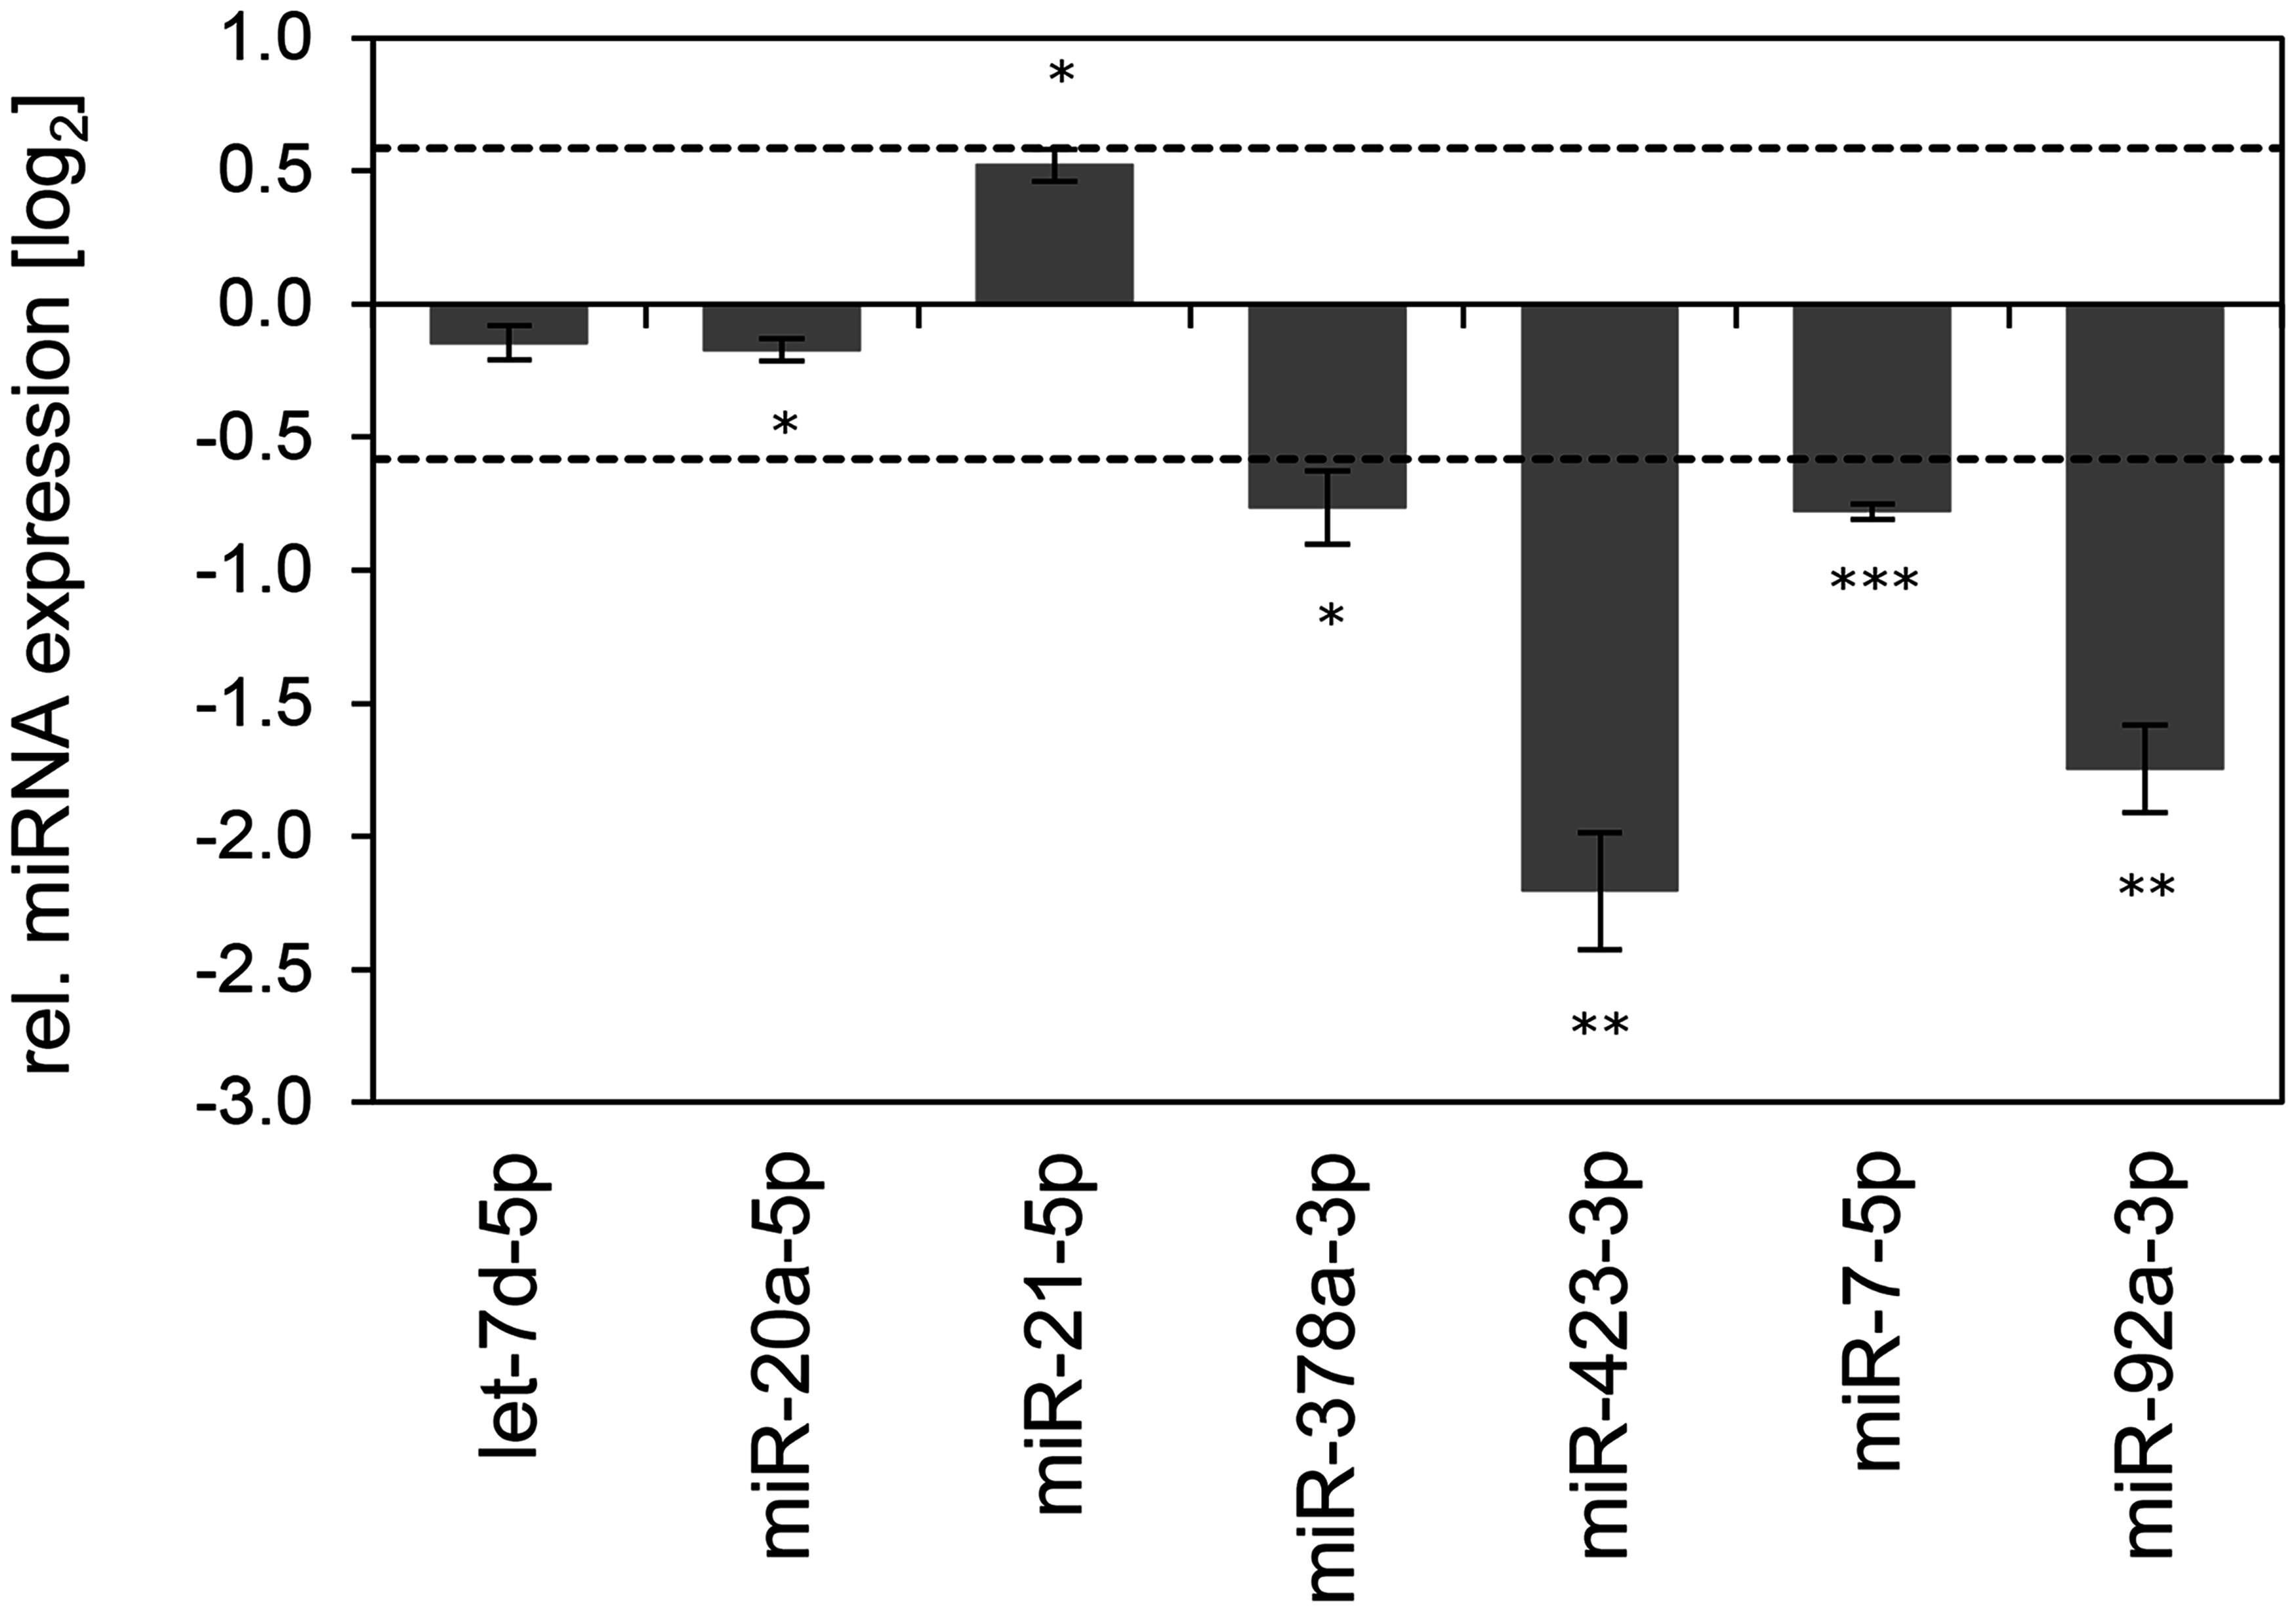 Inhibition of endogenous HPV16 <i>E6/E7</i> expression: Effects on selected exosomal miRNAs.